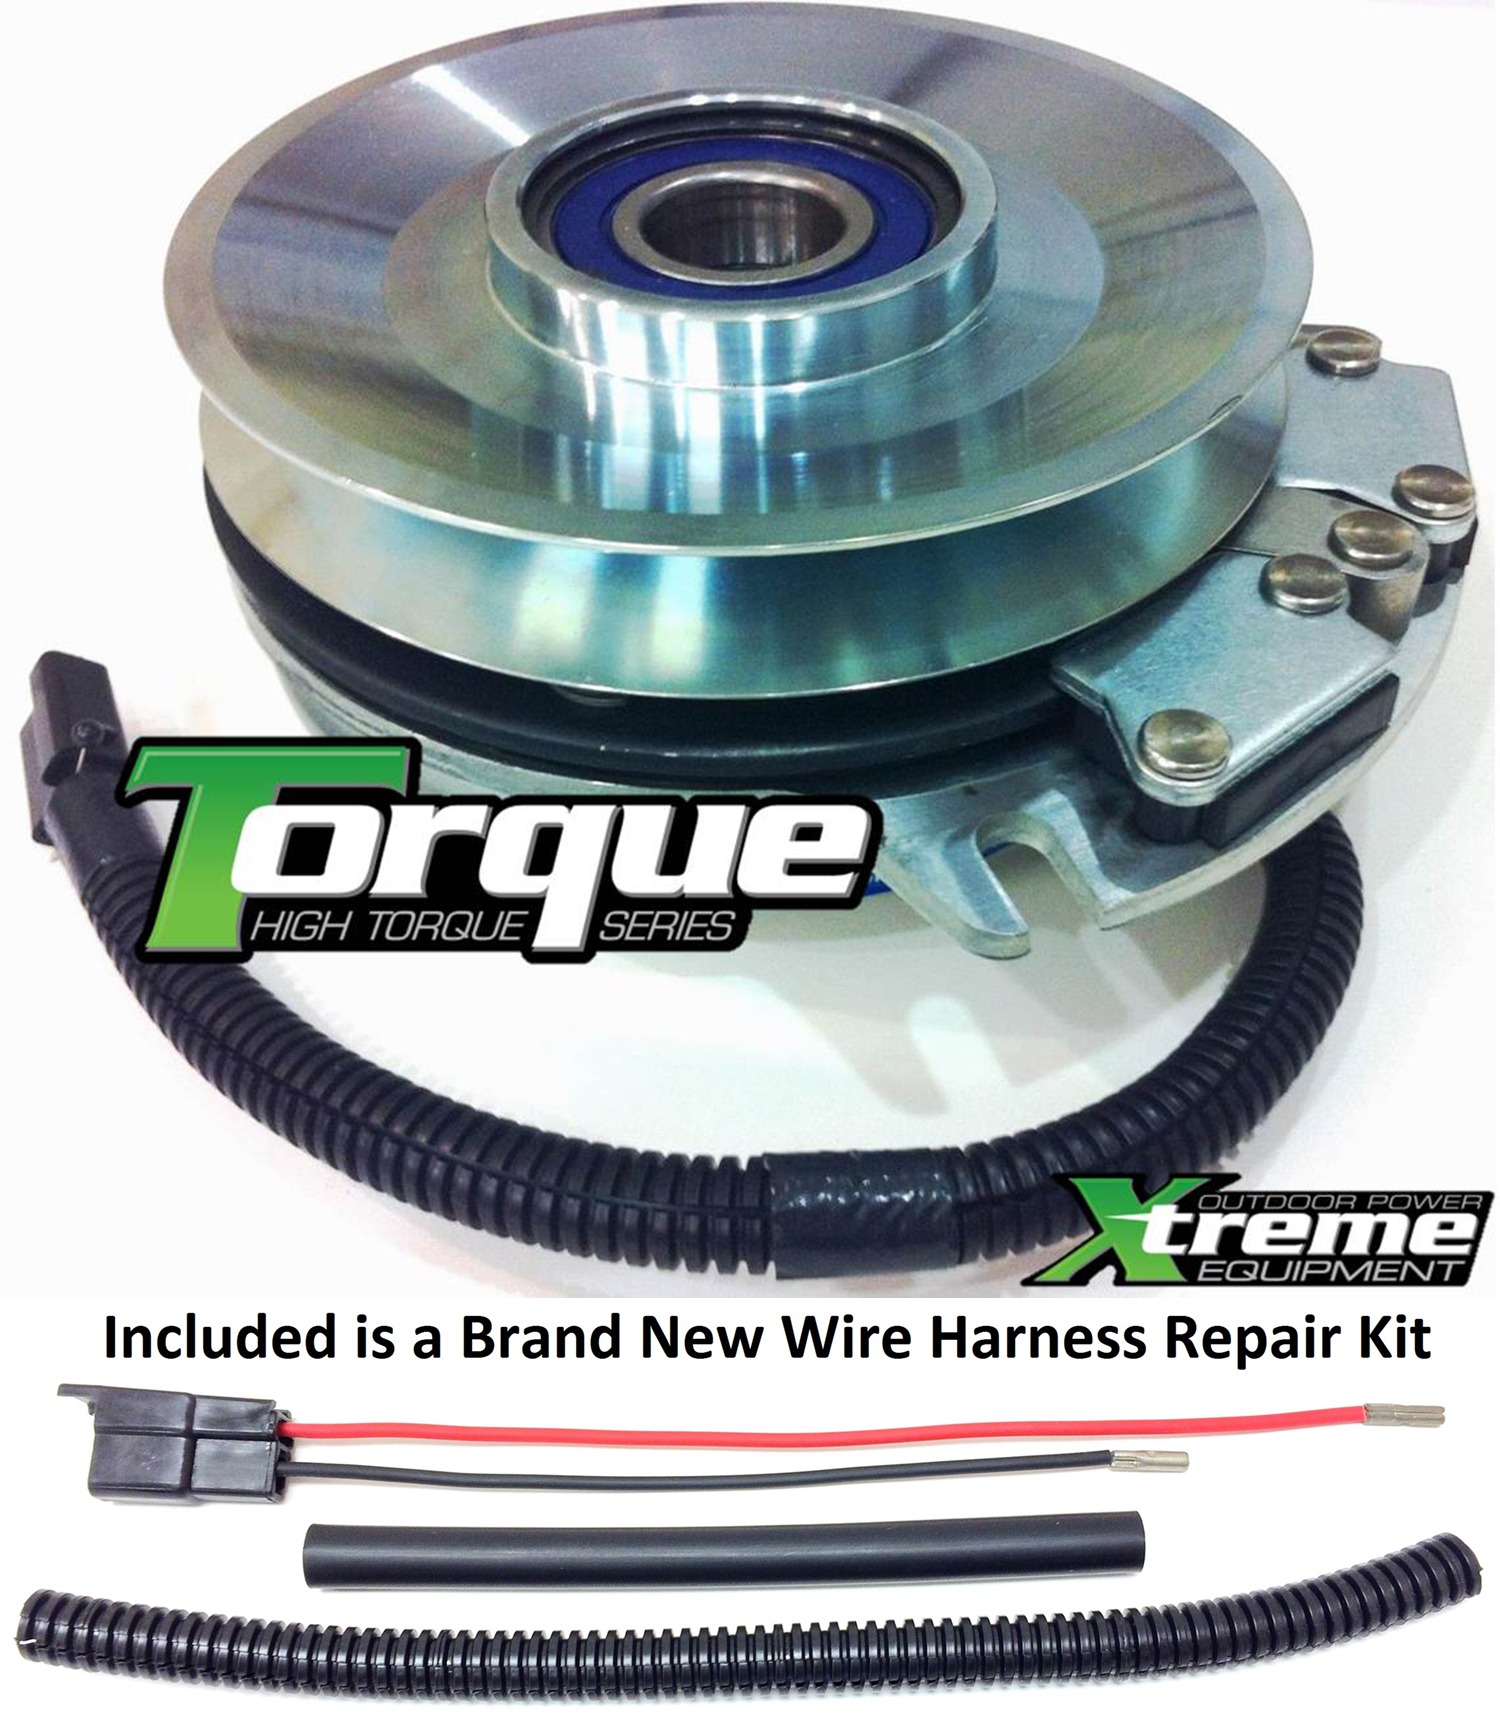 Bundle - 2 items: PTO Electric Blade Clutch, Wire Harness Repair Kit.  Replaces John Deere Mower PTO Clutch Z-Trak 655 TCA12522 -w/ Wire Repair Kit  !